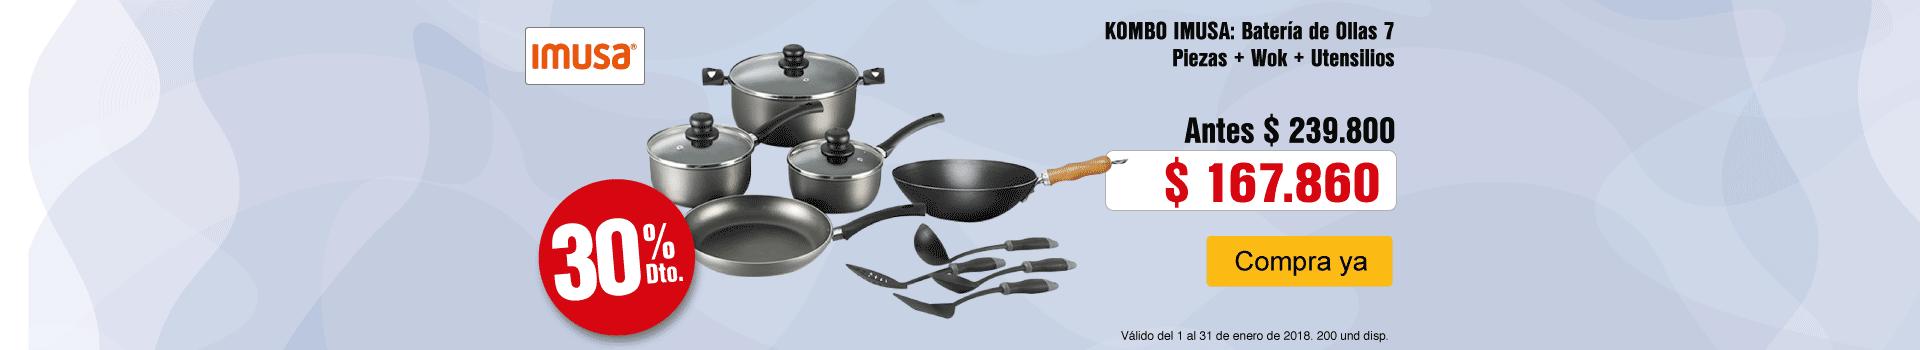 CAT AK-1-cocina-kombo-imusa-bateria-wok-ene3-31